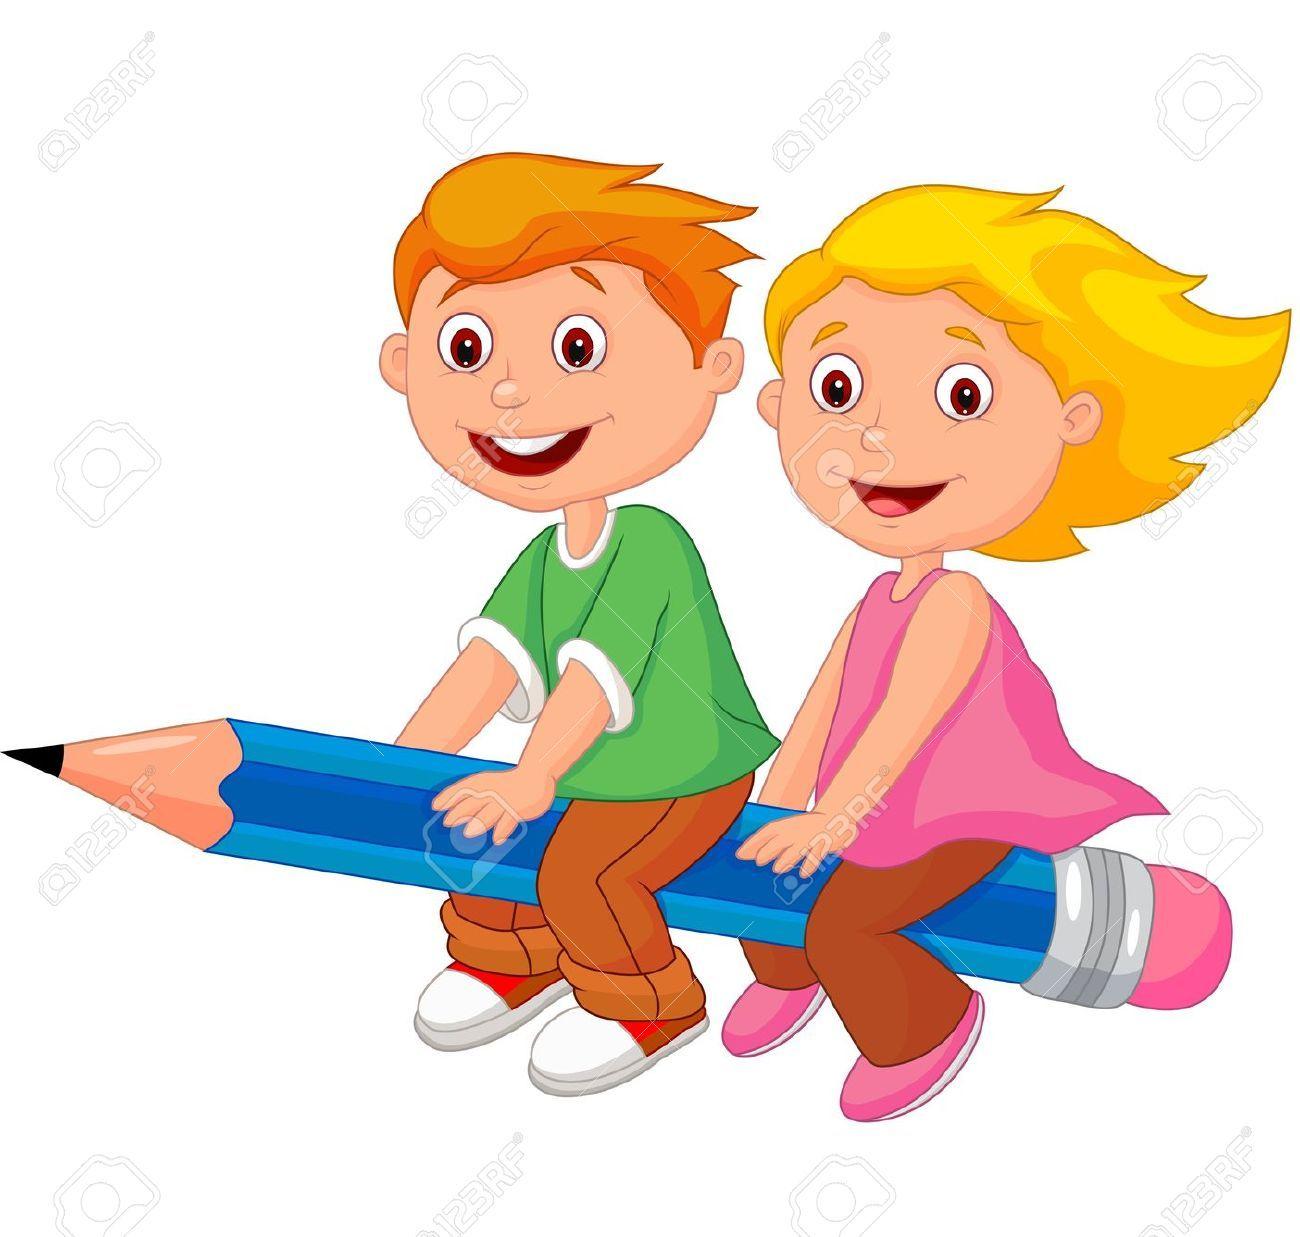 Children clipart. S k p google